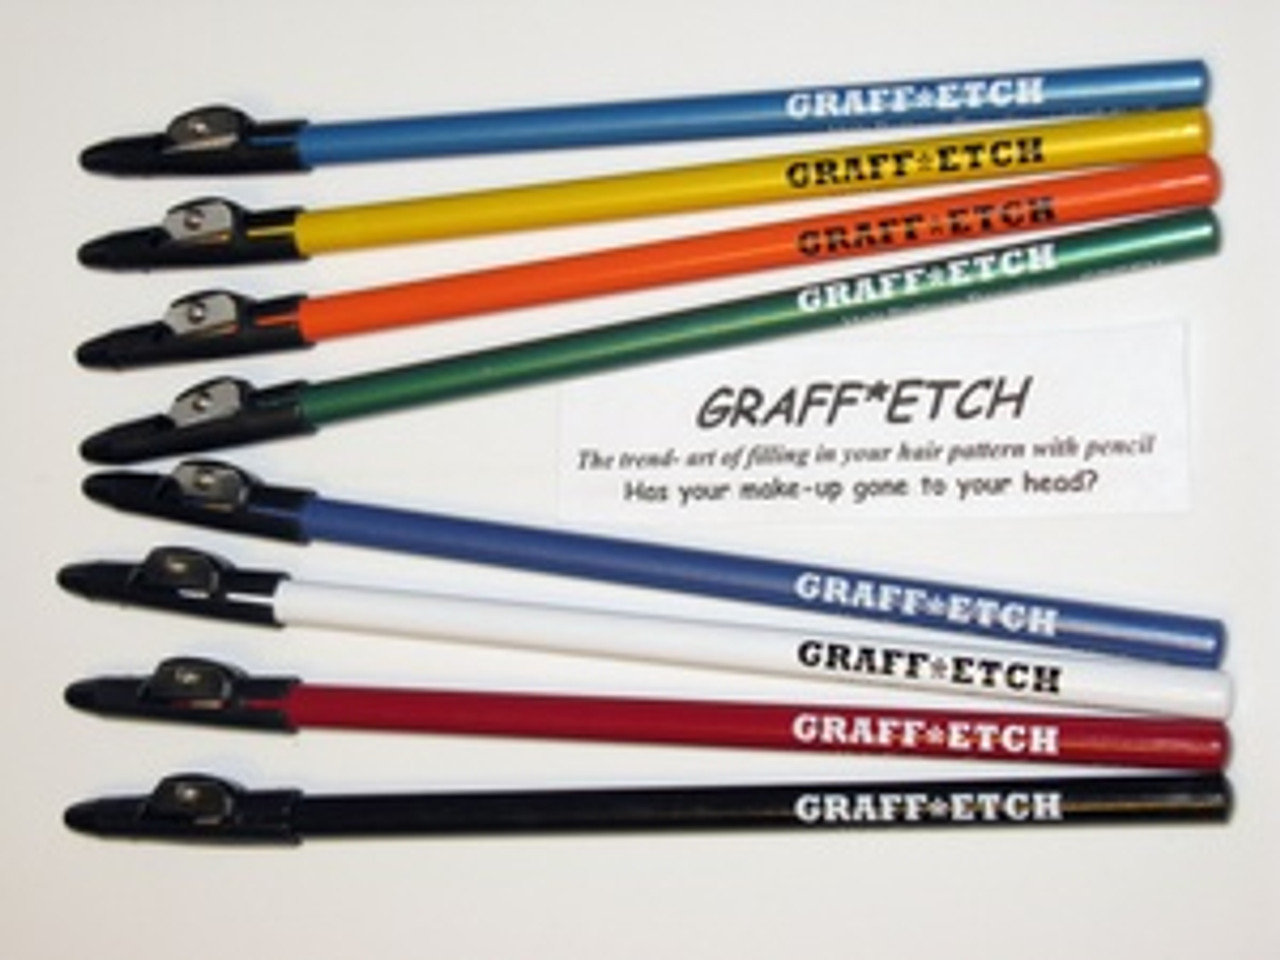 Graff Etch Pencils